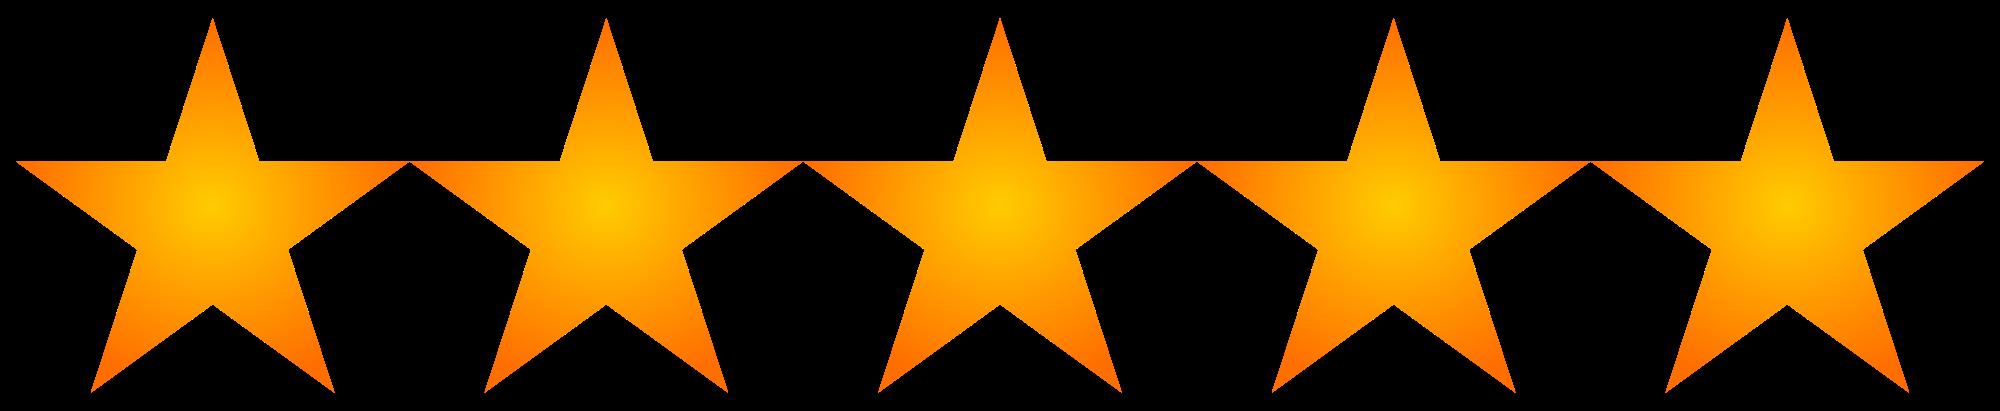 5 Star property management service